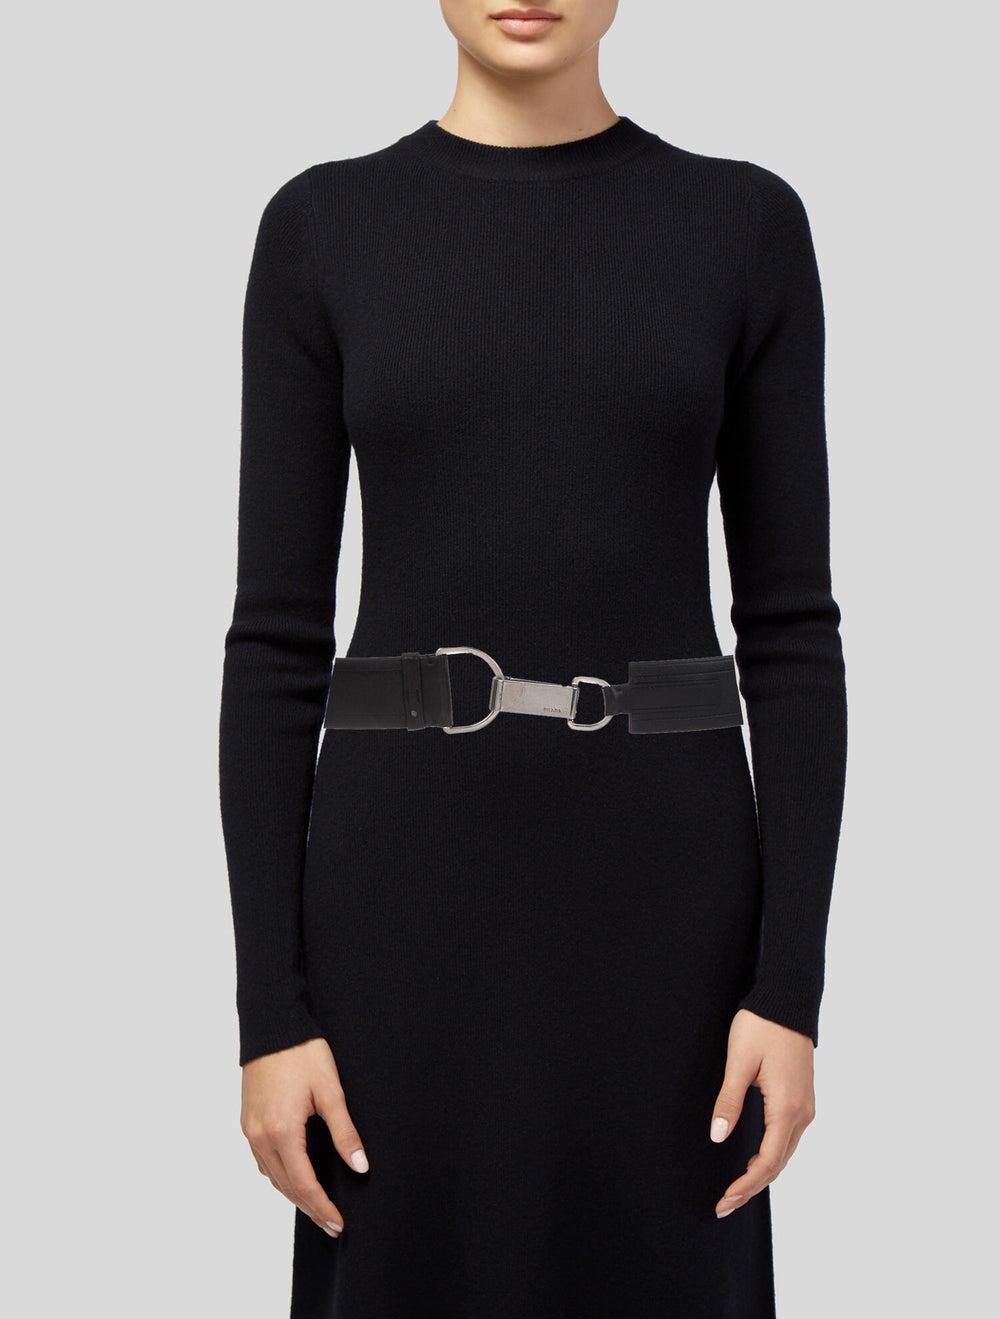 Prada Leather Hip Belt Black - image 2